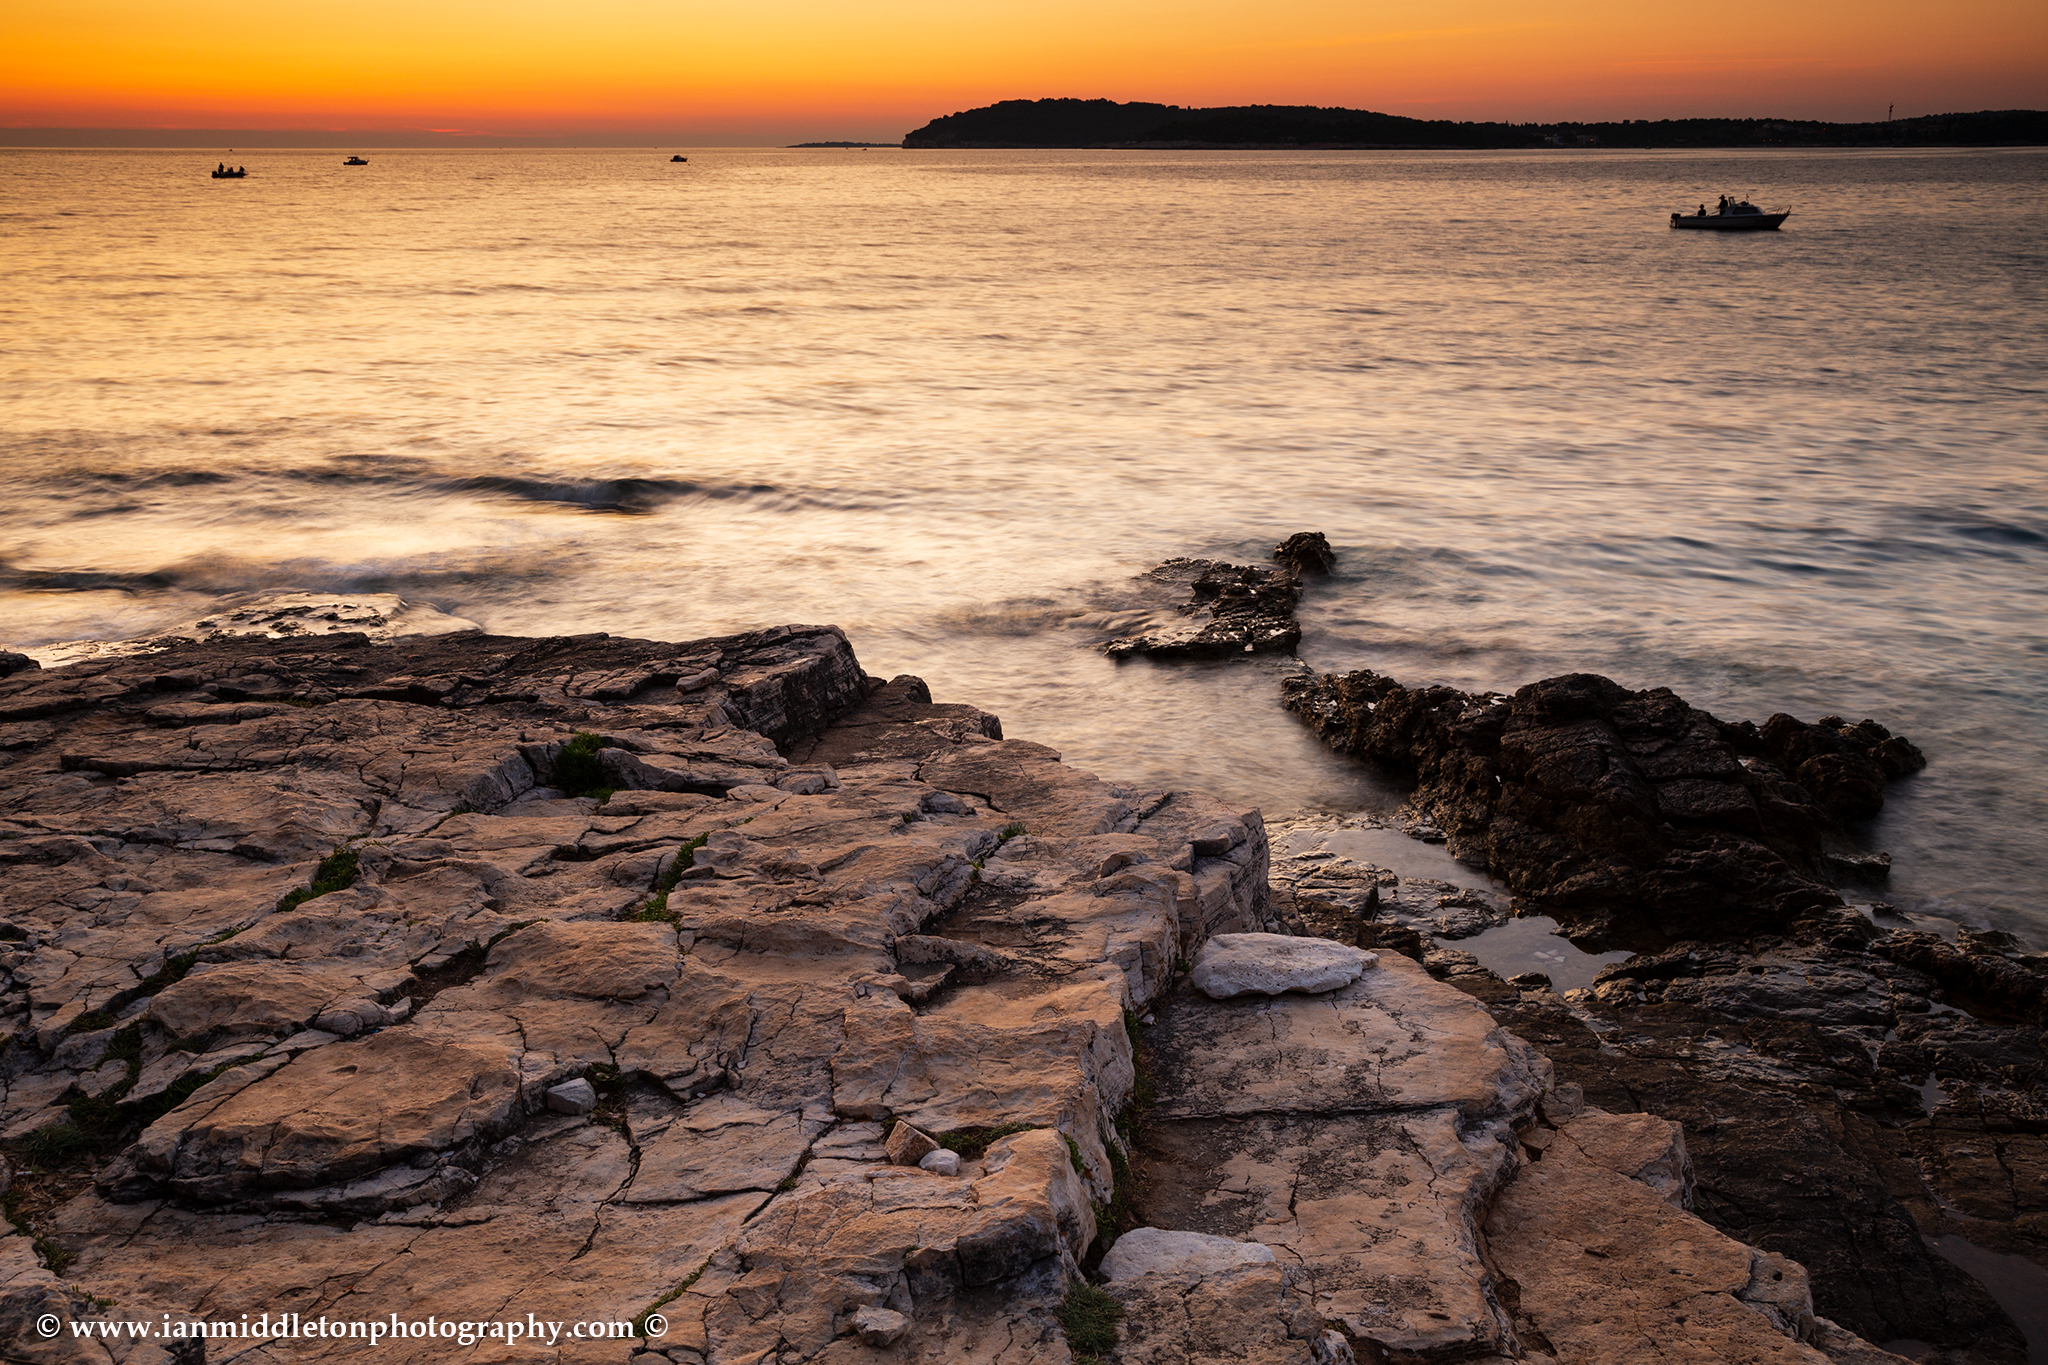 Verudela Beach, Pula, Croatia. The beautiful Istrian coastline at sunset.